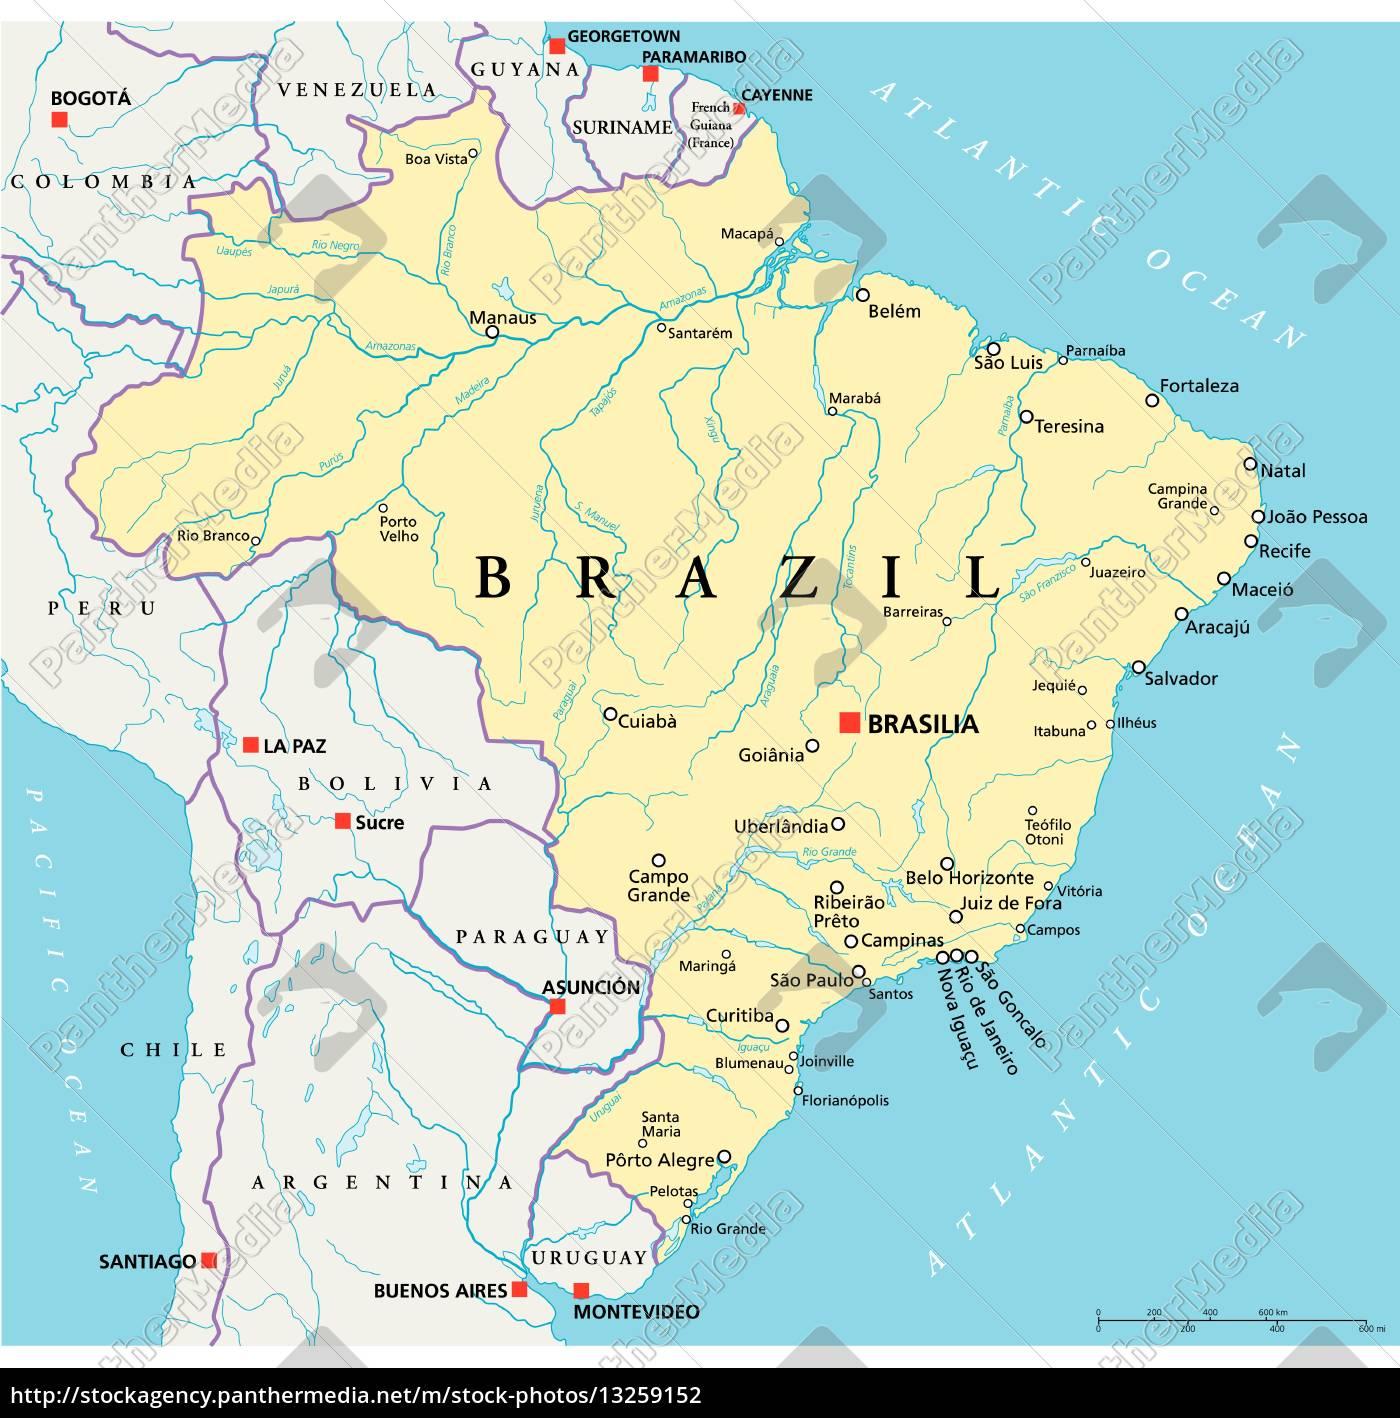 brasilien political map - Lizenzfreies Foto - #13259152 ...